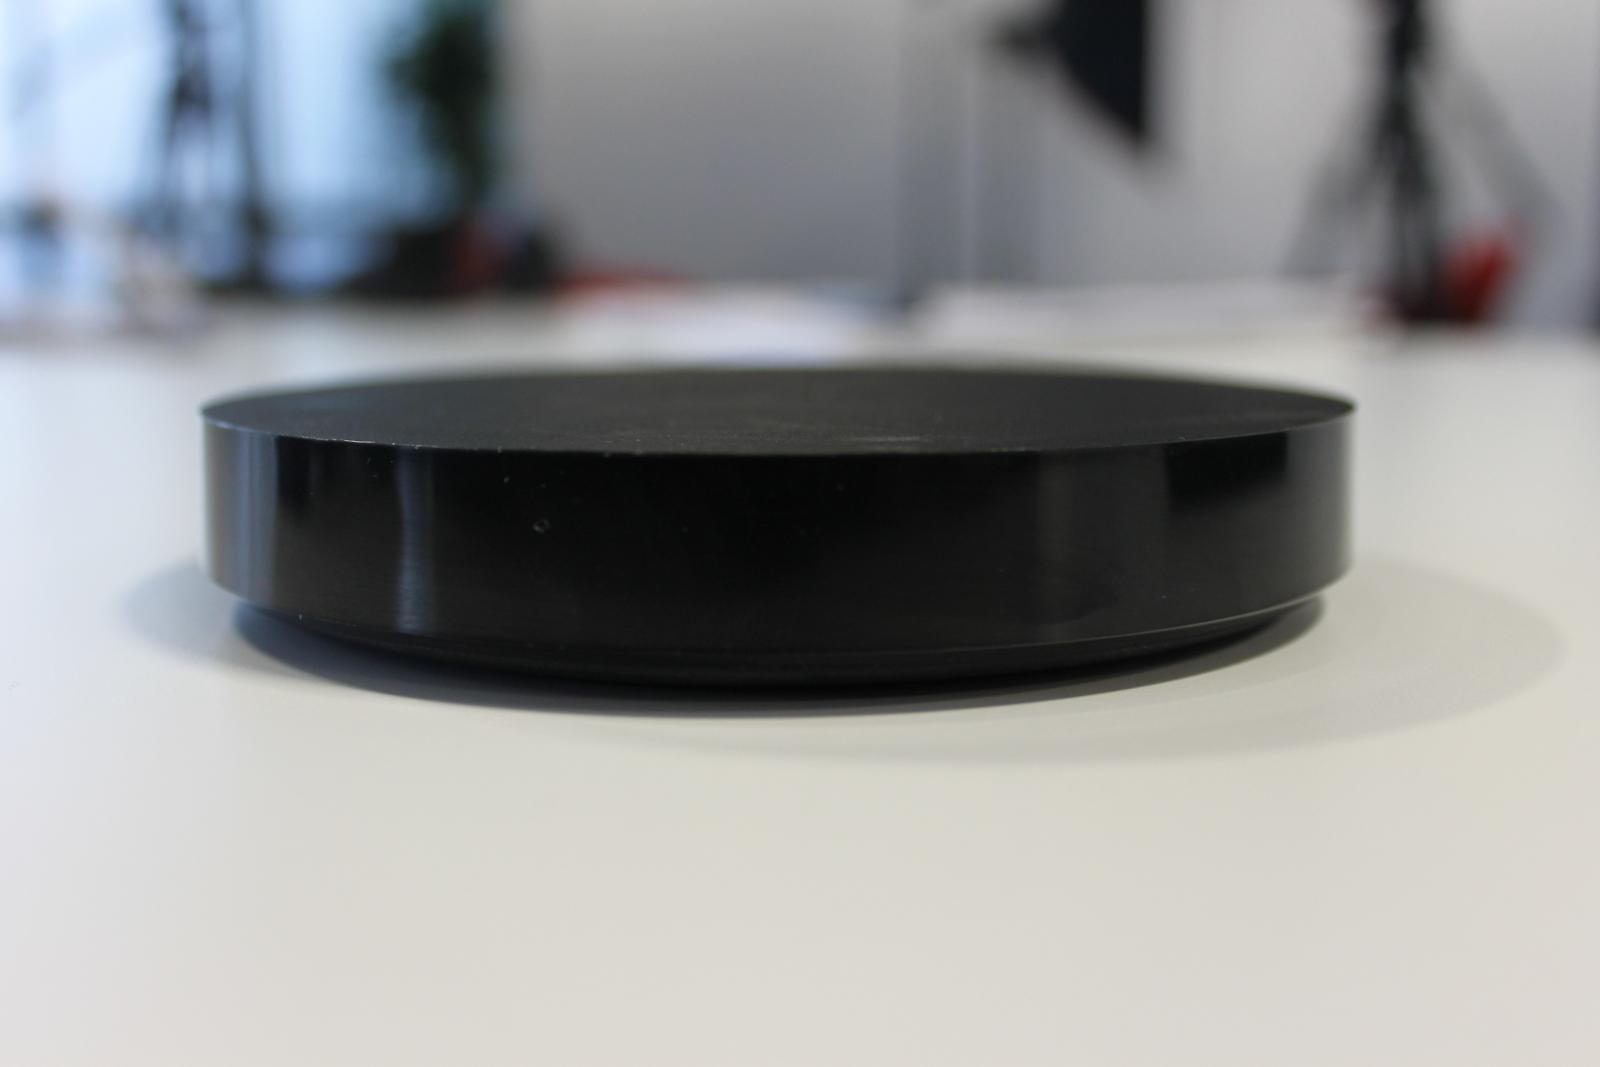 Google Nexus Player Review